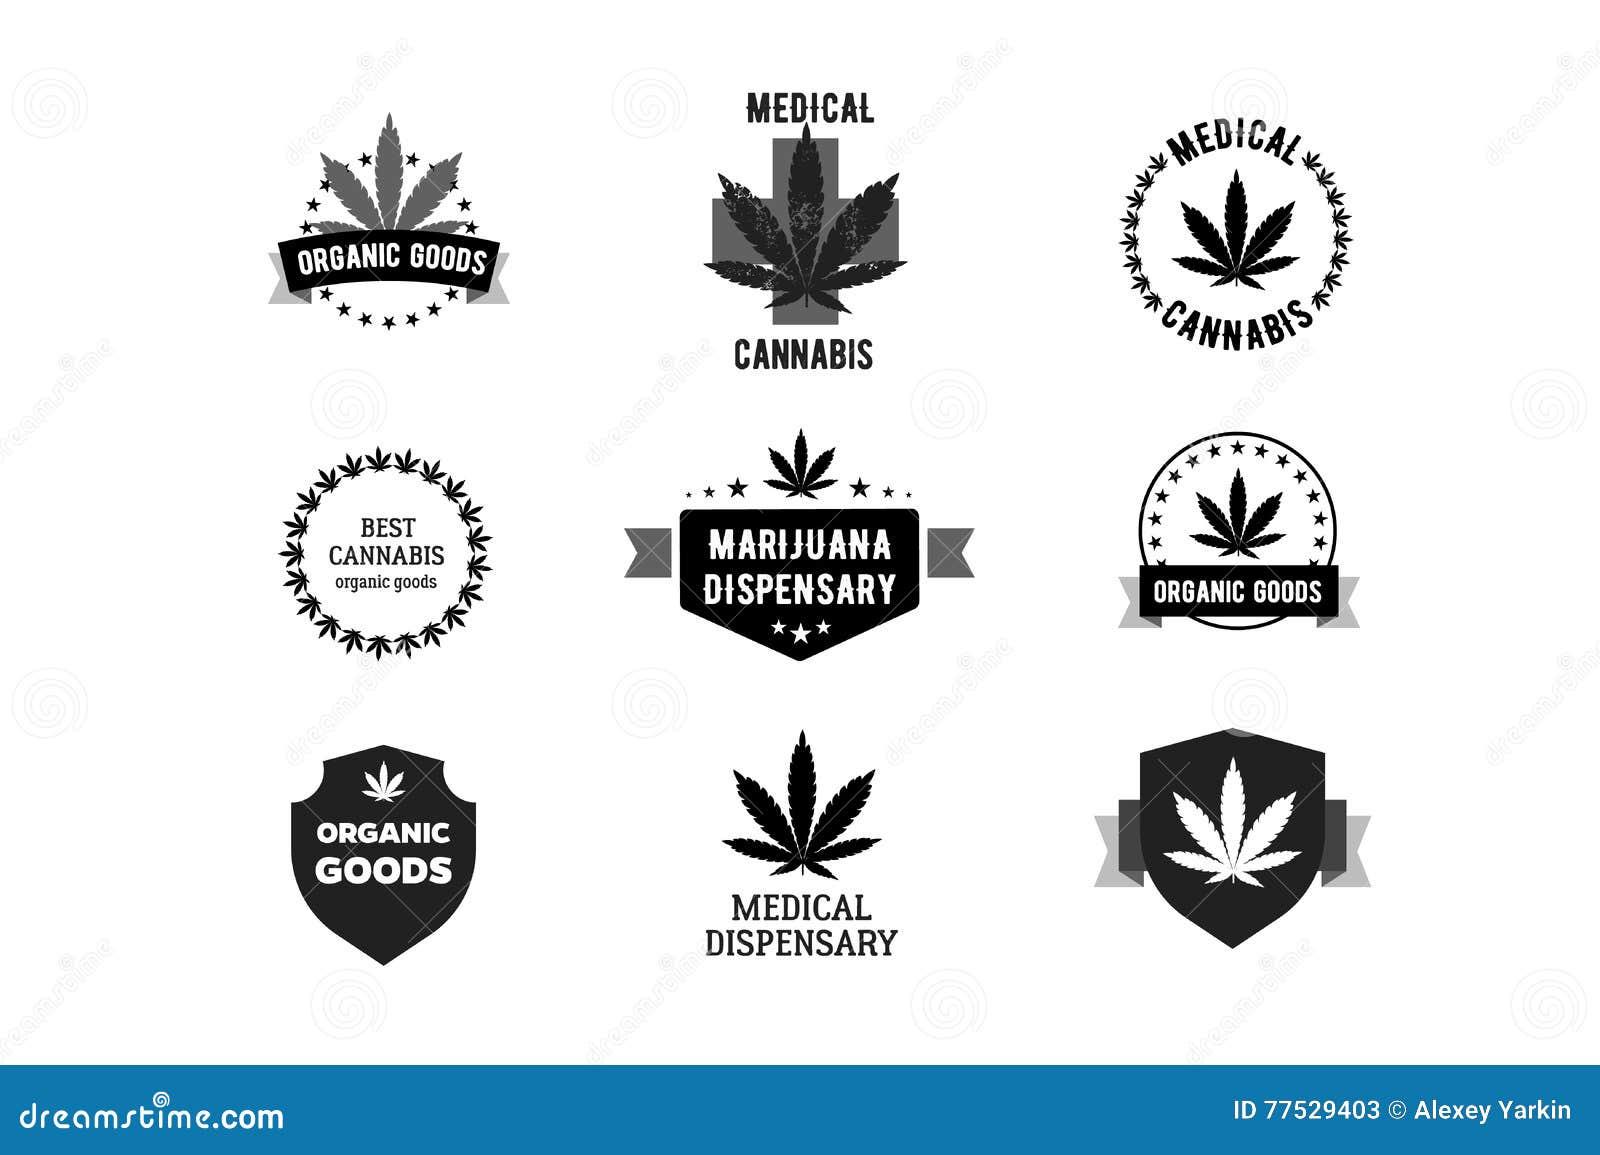 Labels for medical marijuana cannabis logo stock vector labels for medical marijuana cannabis logo biocorpaavc Choice Image